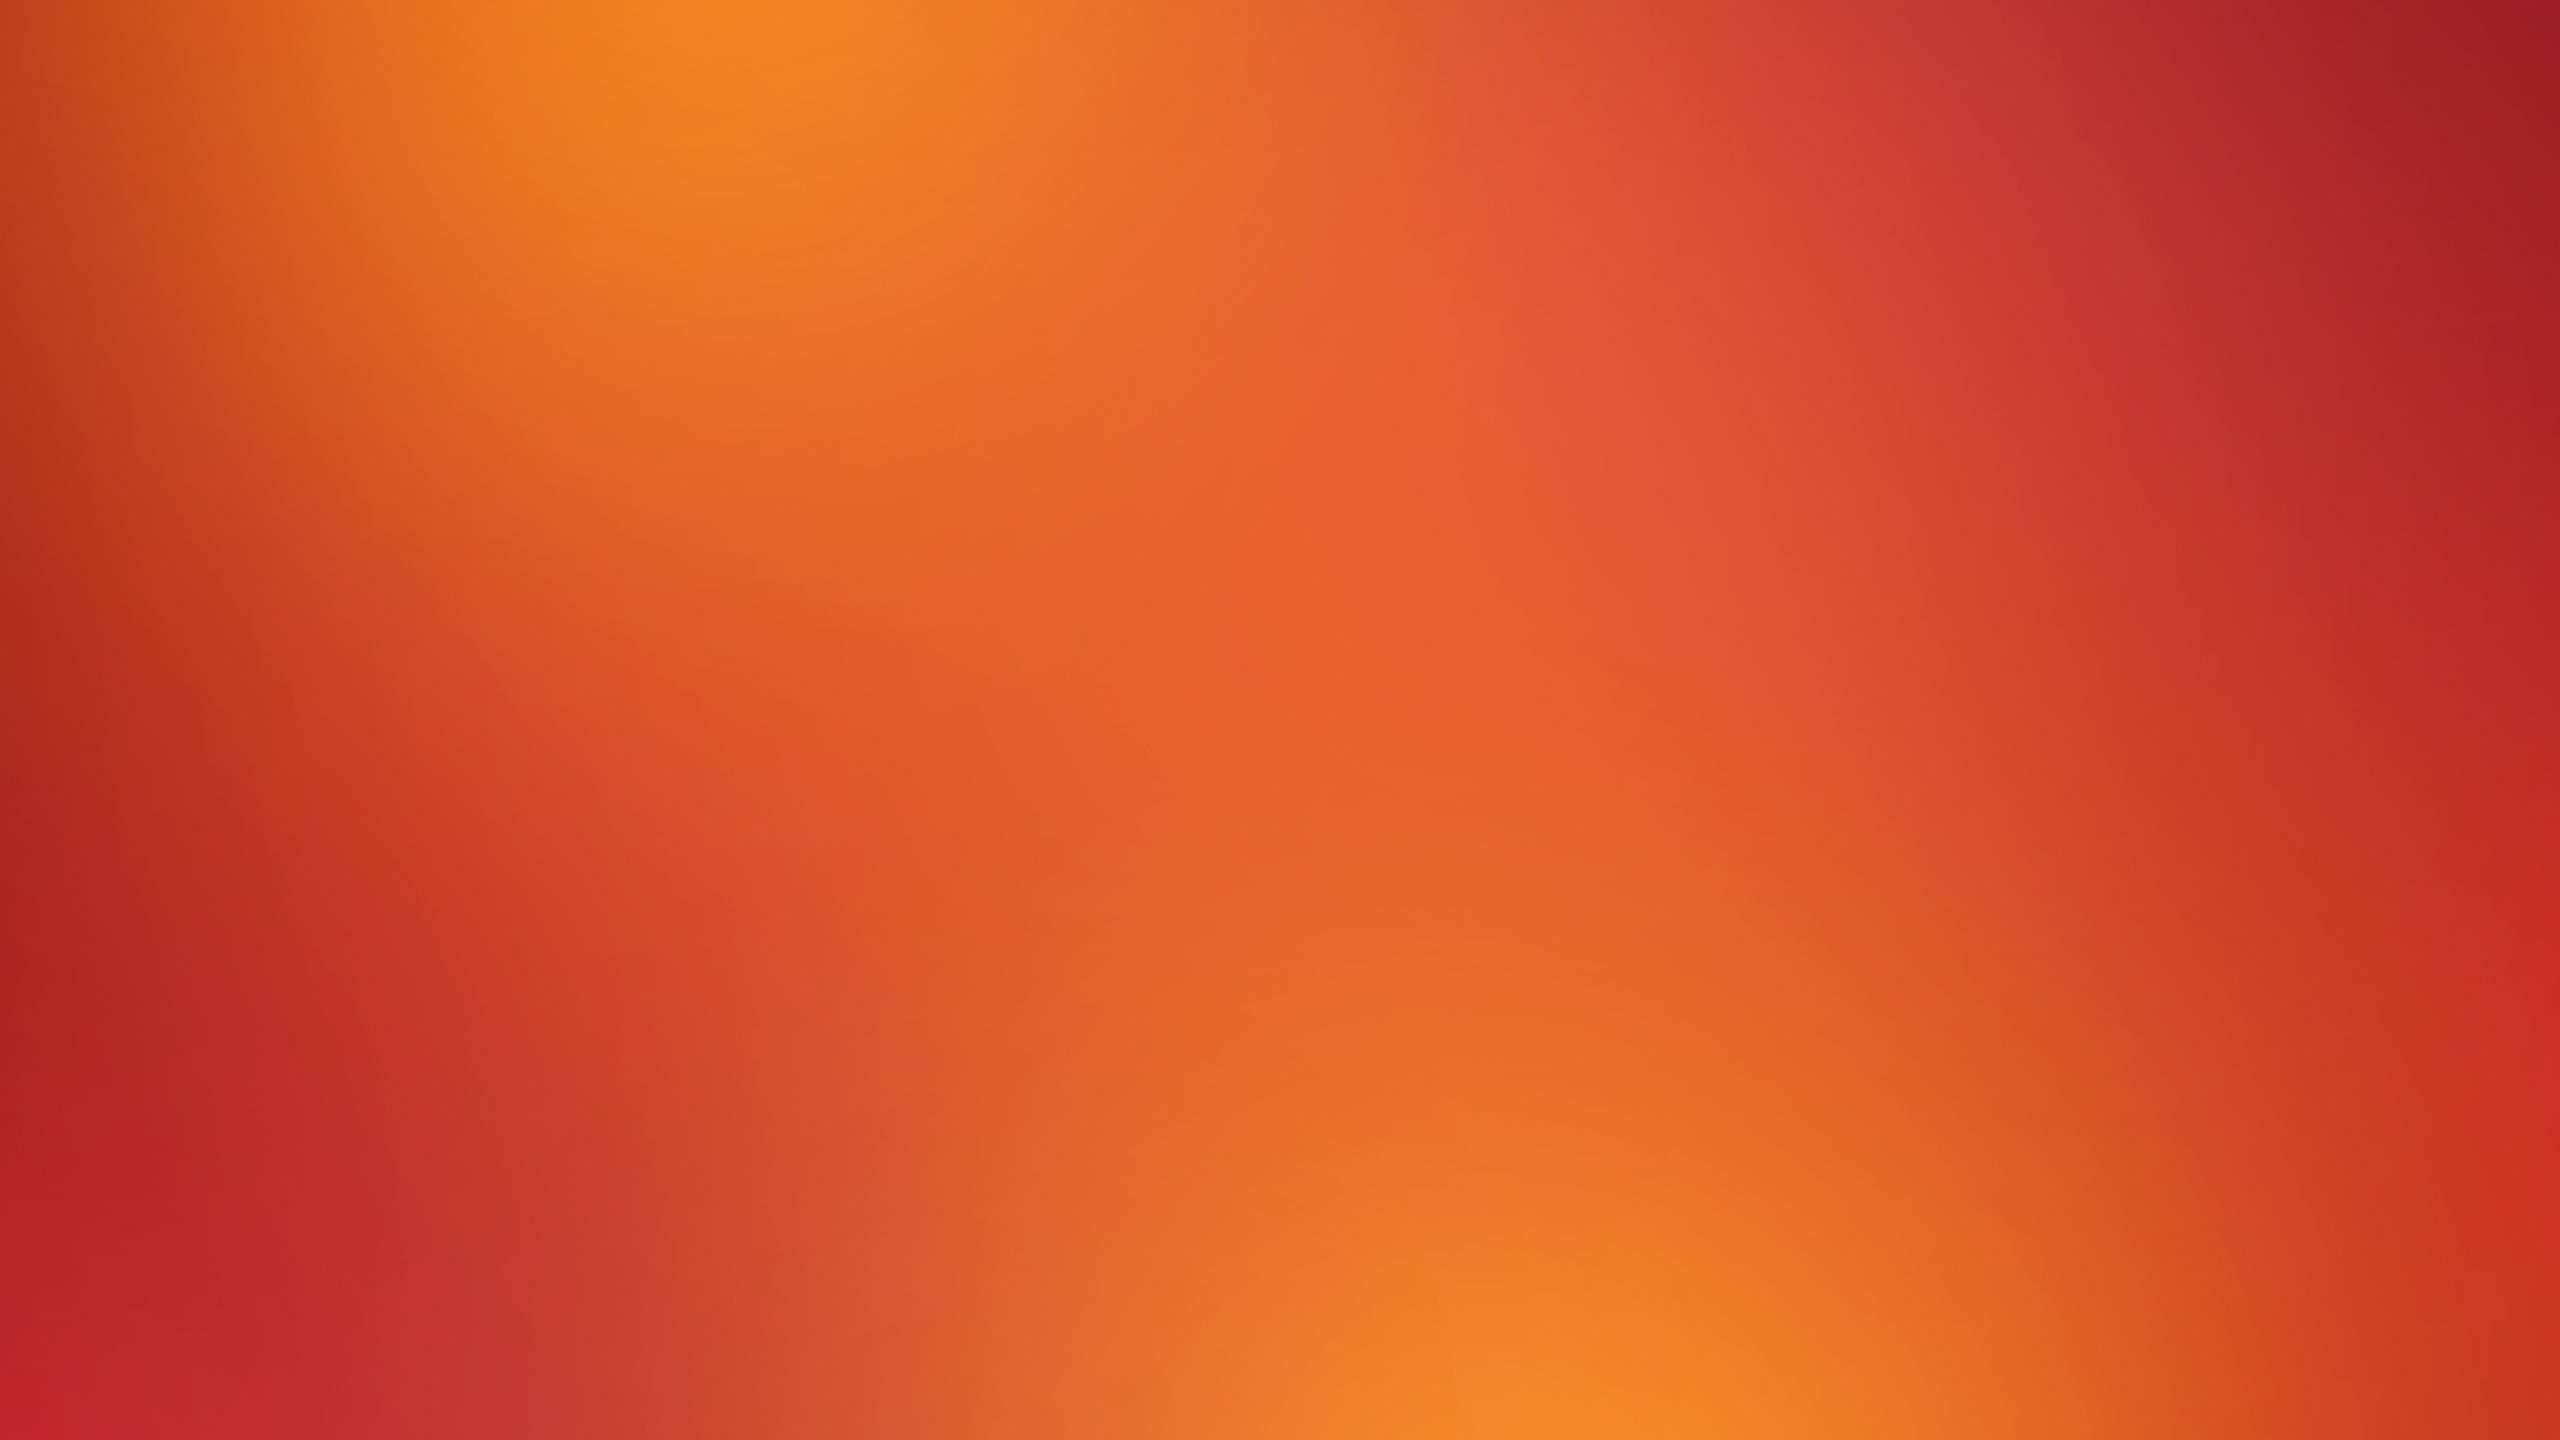 Yellow background images wallpaper cave - Red And Orange Wallpaper Wallpapersafari